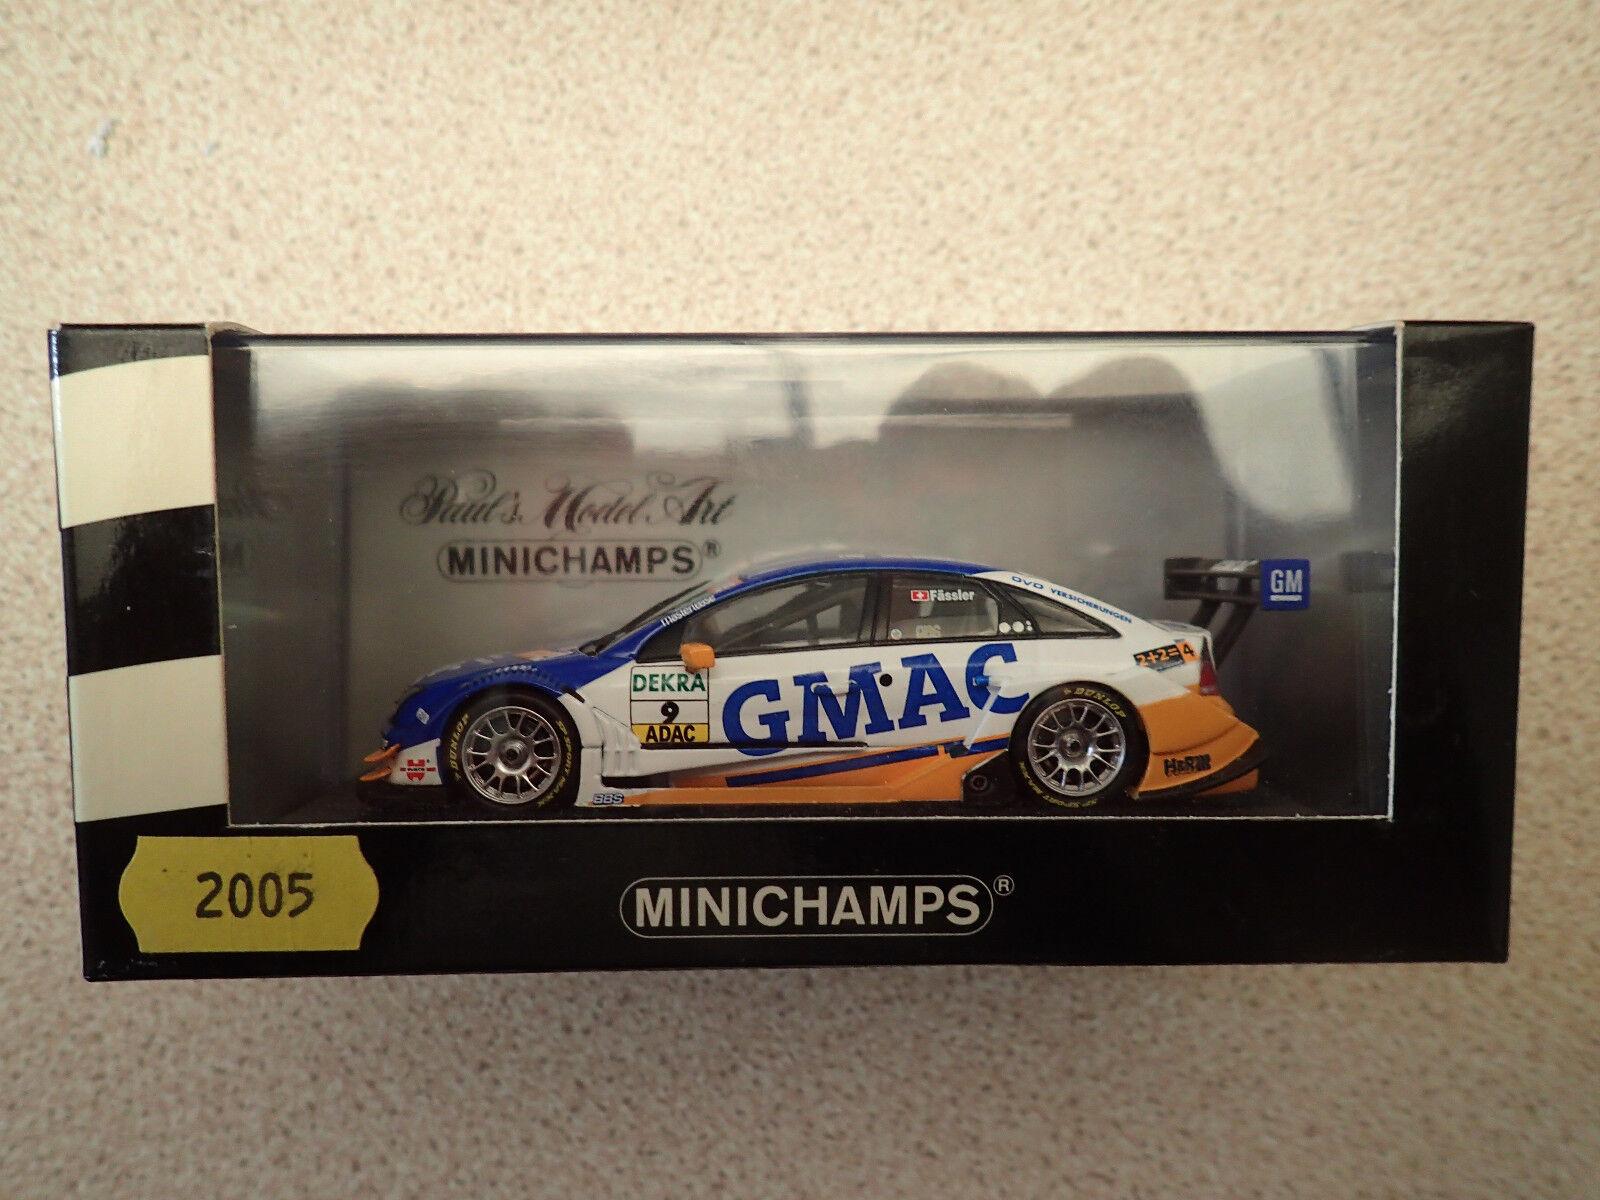 Ltd Edn Minichamps 1 43 400 054609 Opel Vectra GTS V8 DTM 2005 Team OPC